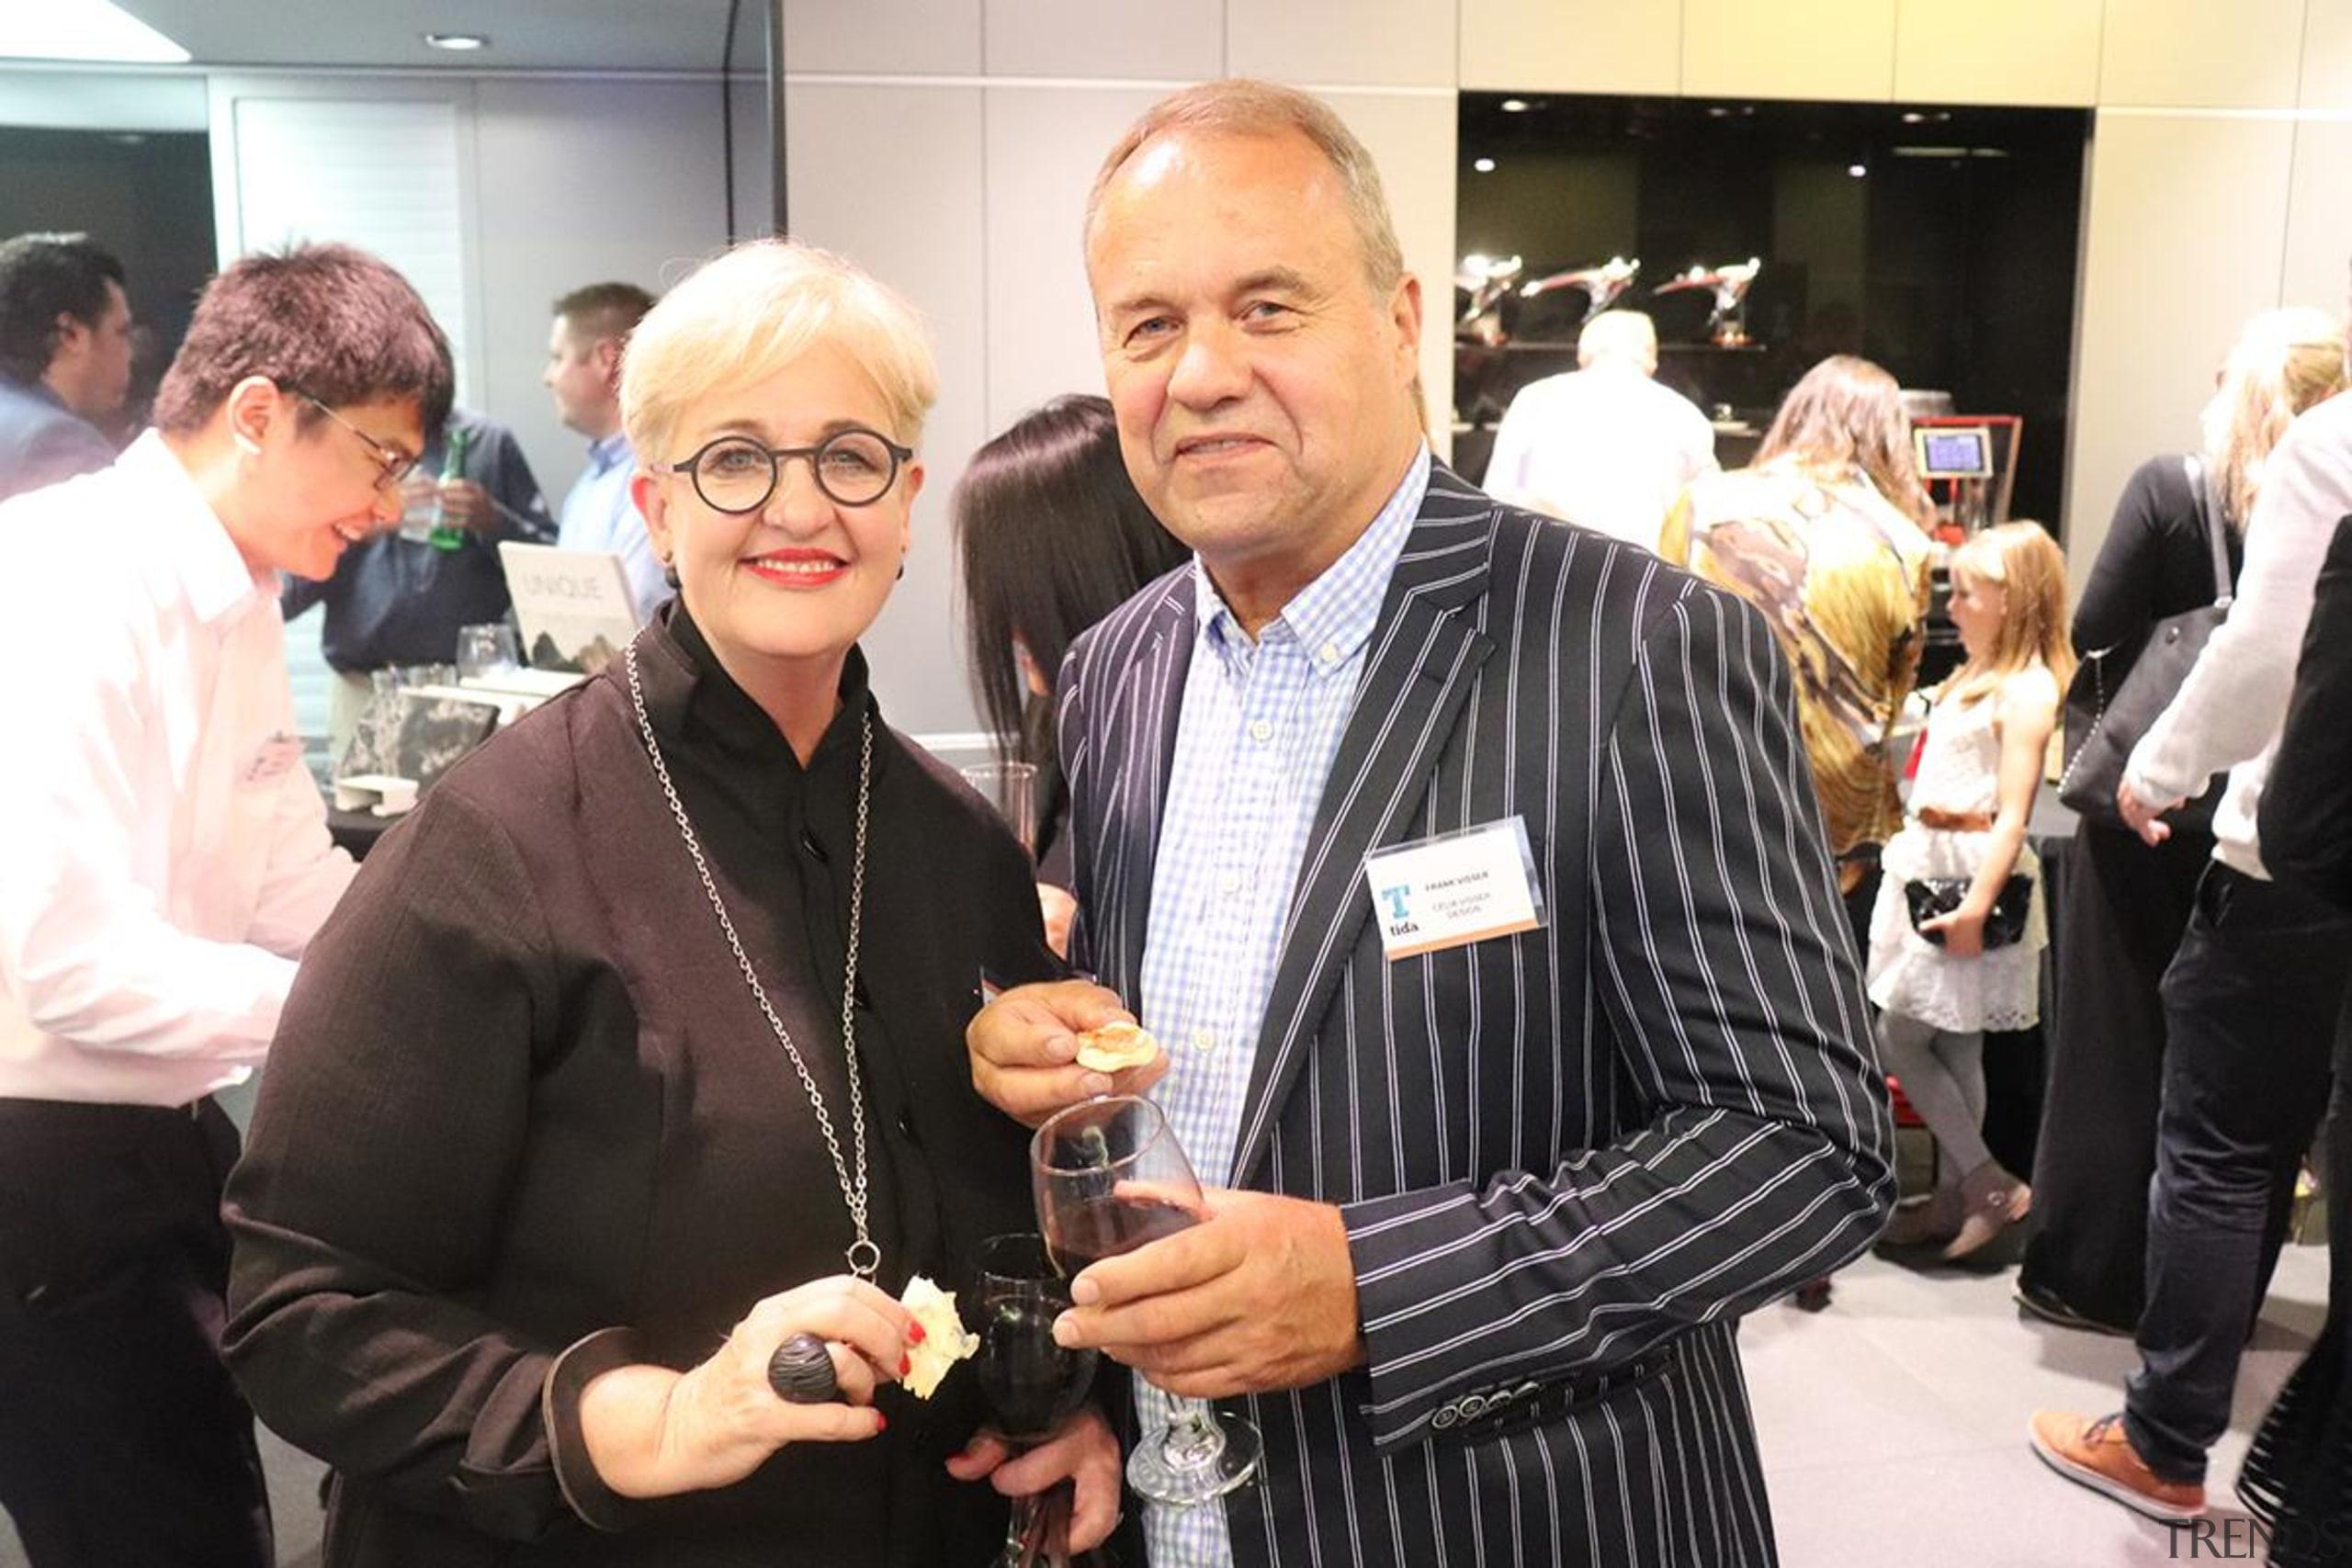 Celia and Frank Visser - event   eyewear event, eyewear, black, white